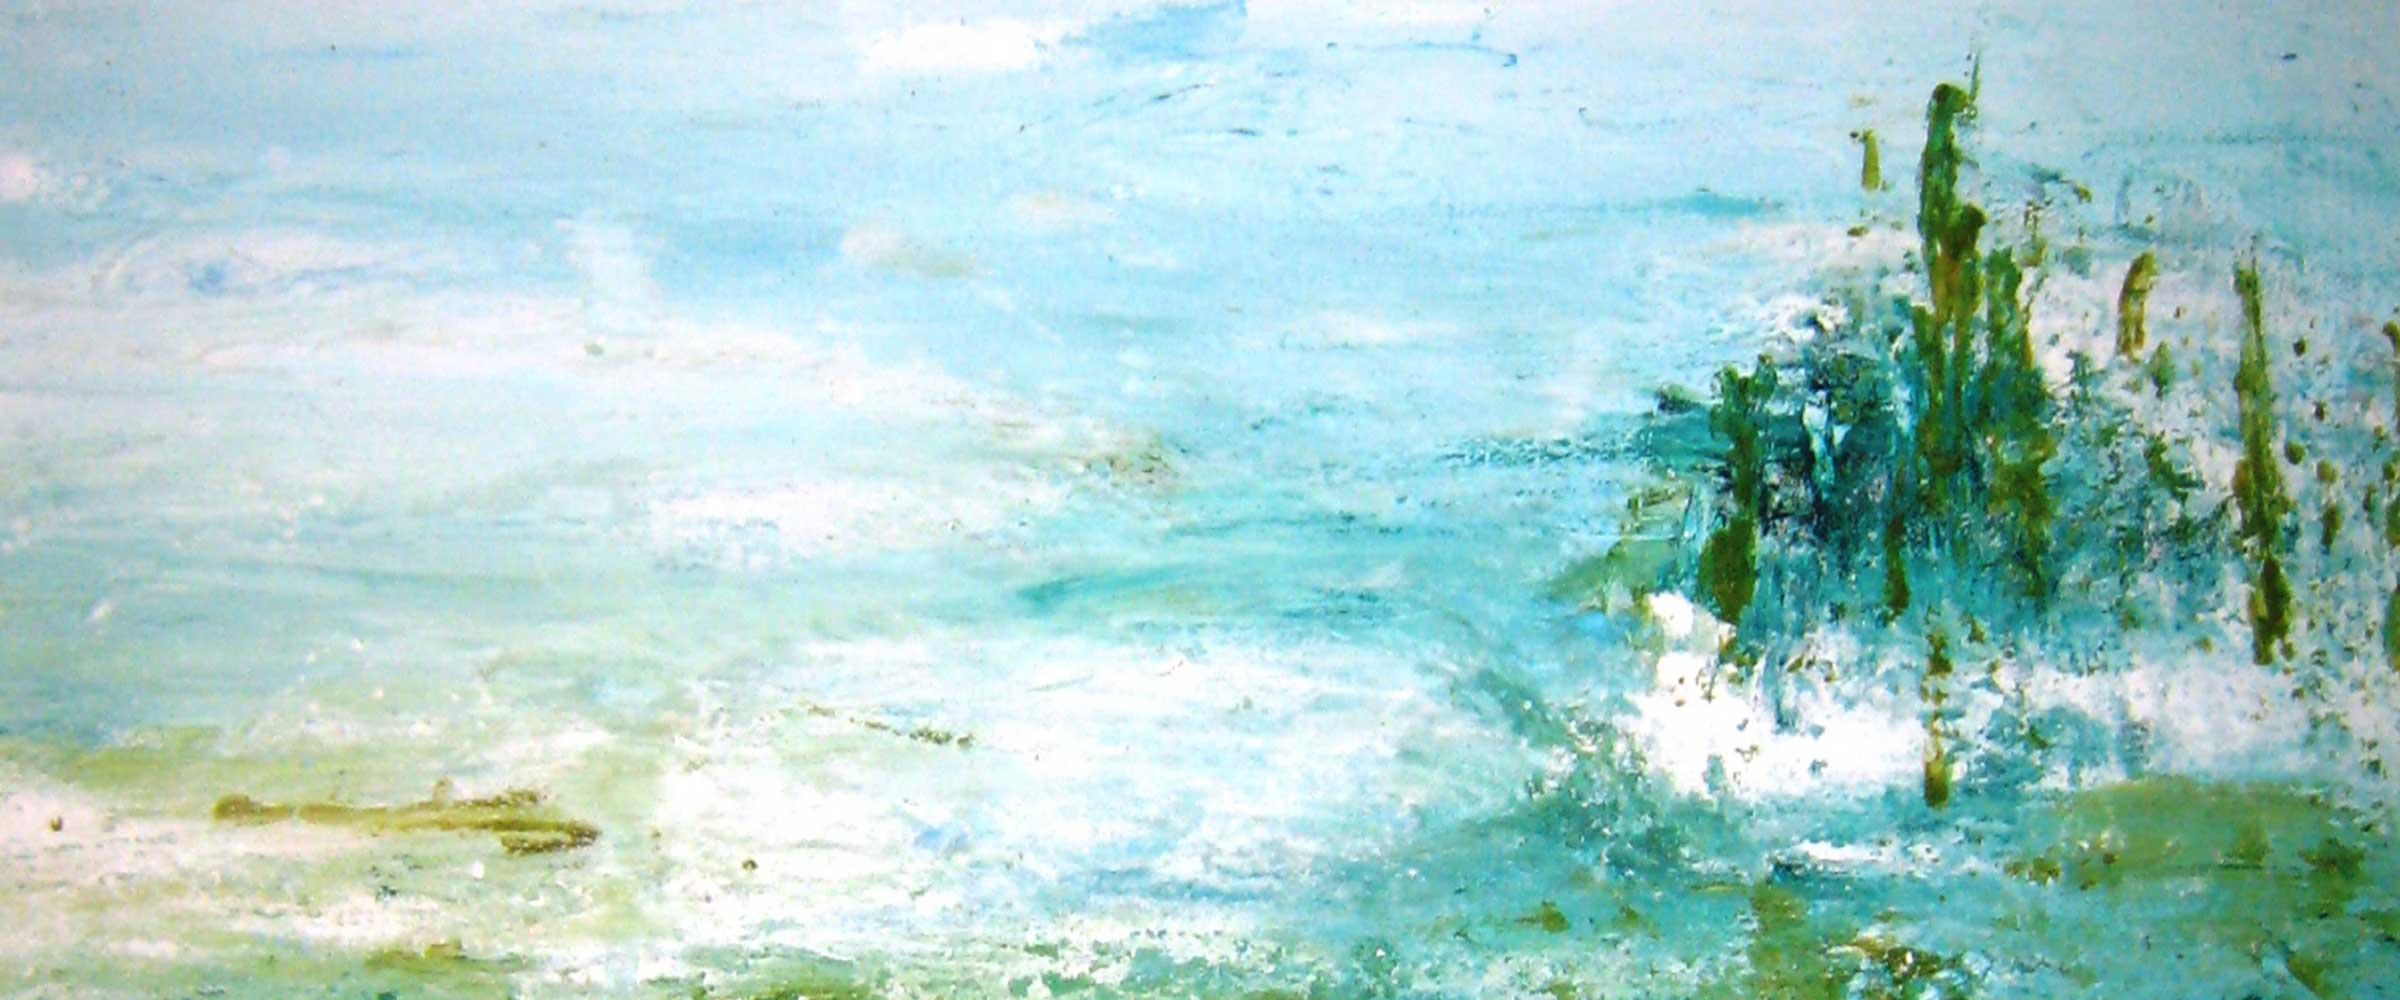 PEA Meeresbrise Ausschnitt